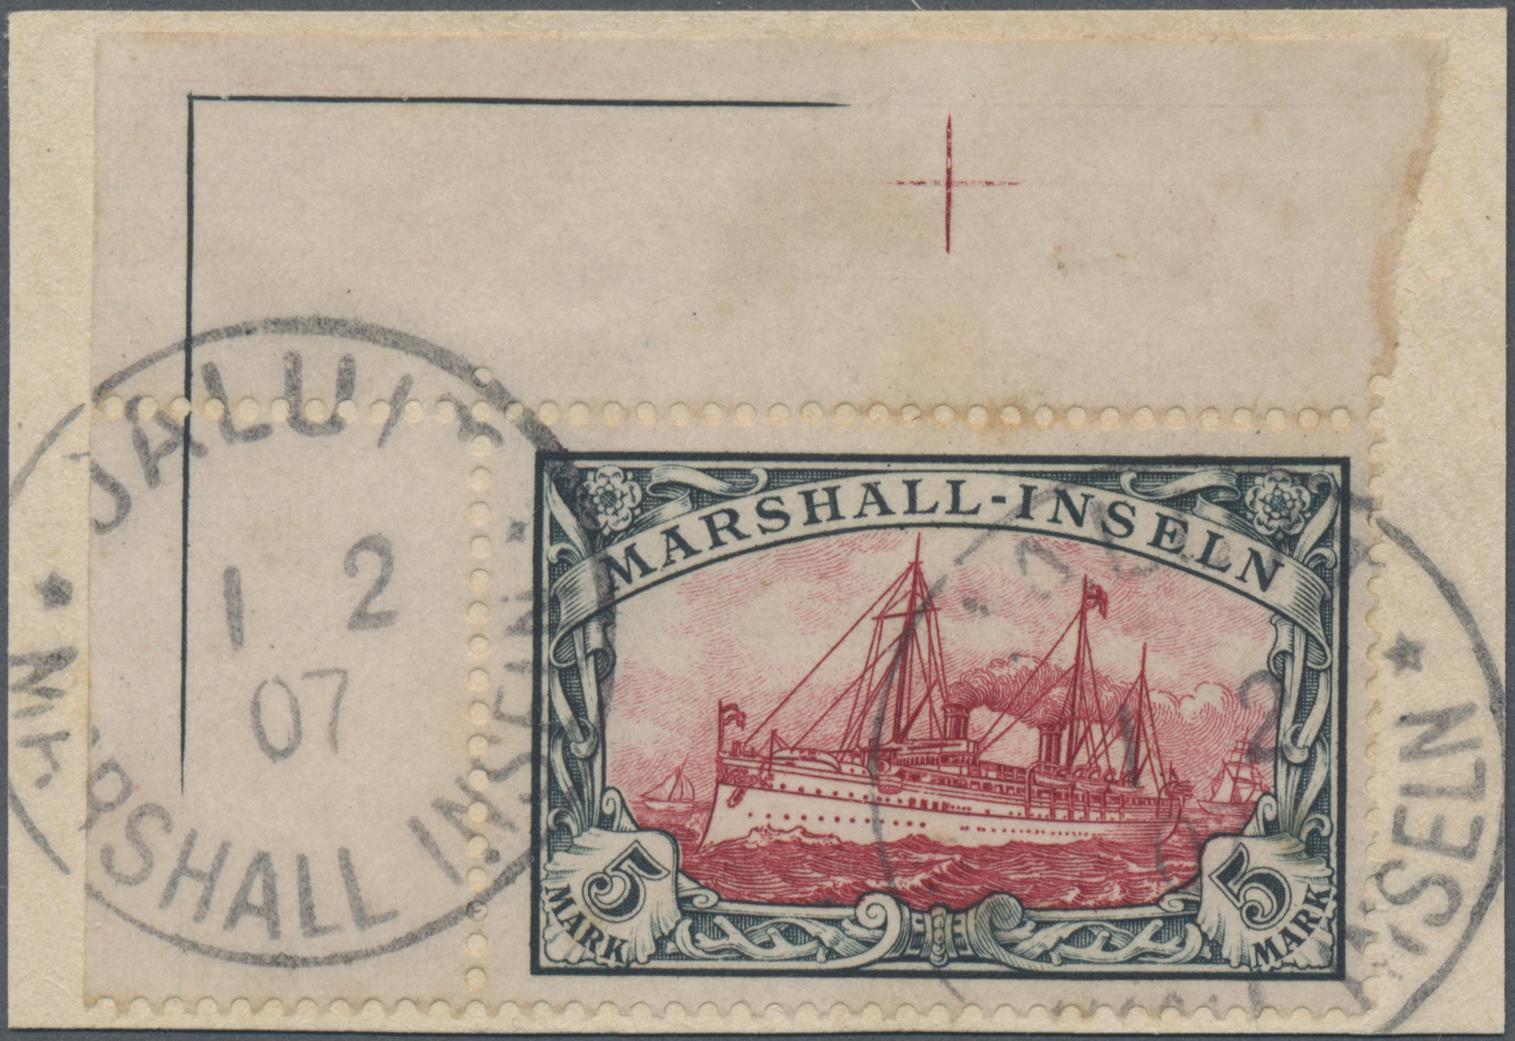 Lot 22843 - Deutsche Kolonien - Marshall-Inseln  -  Auktionshaus Christoph Gärtner GmbH & Co. KG Sale #44 Germany, Picture Post cards